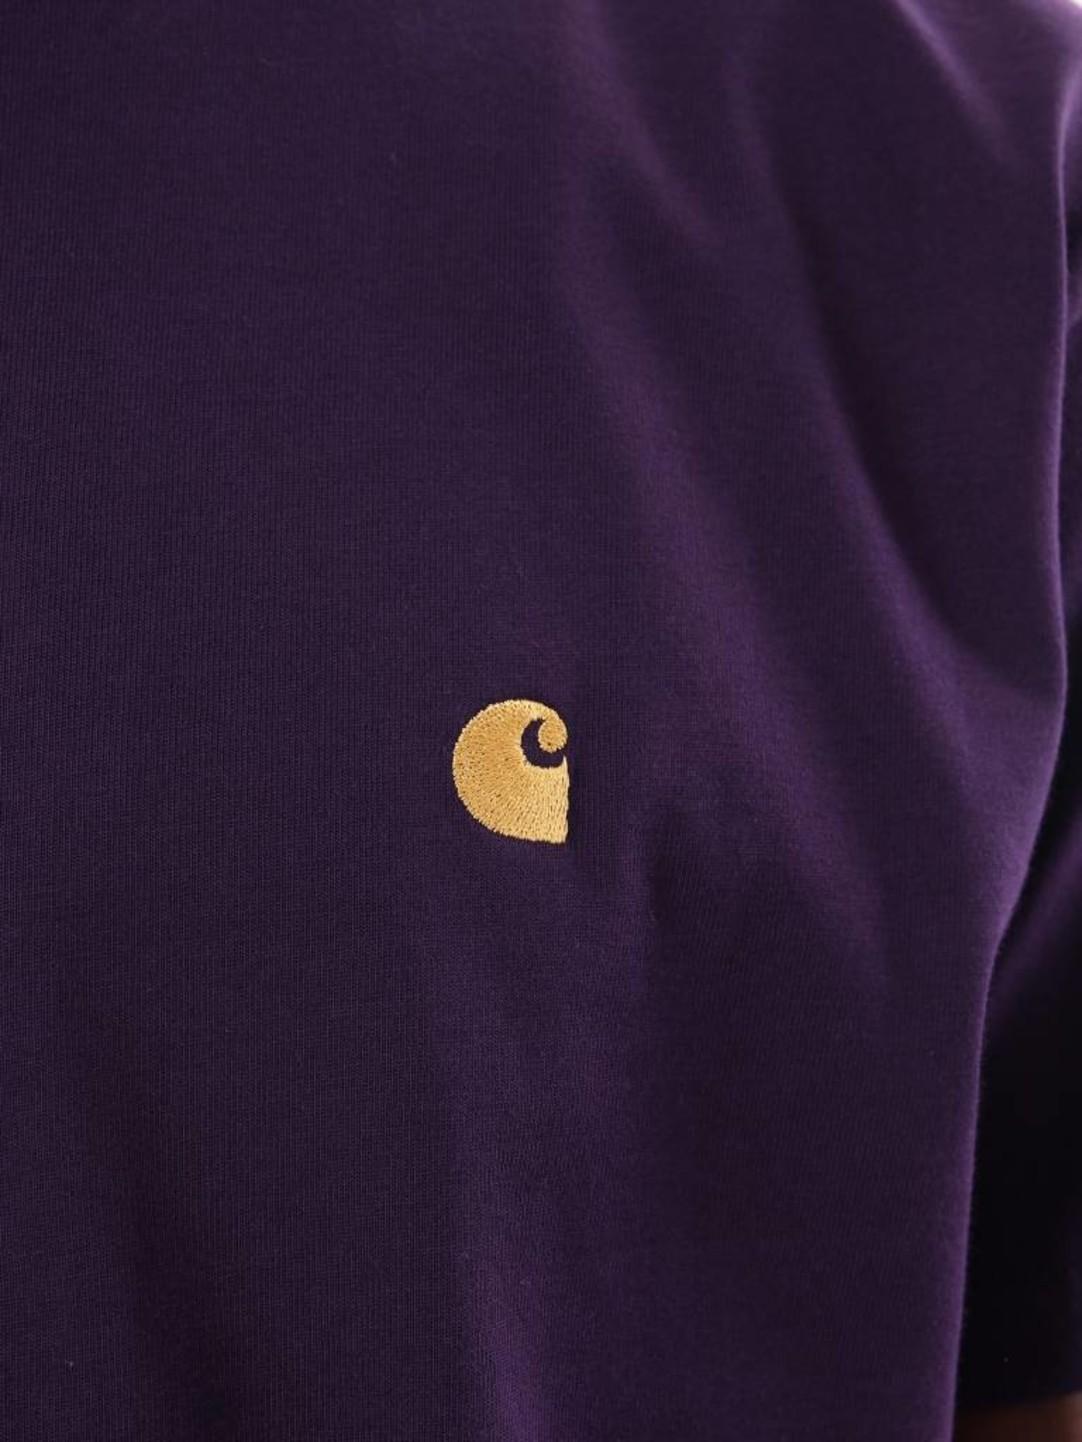 Carhartt WIP Carhartt WIP Chase T-Shirt Lakers Gold I026391-88990